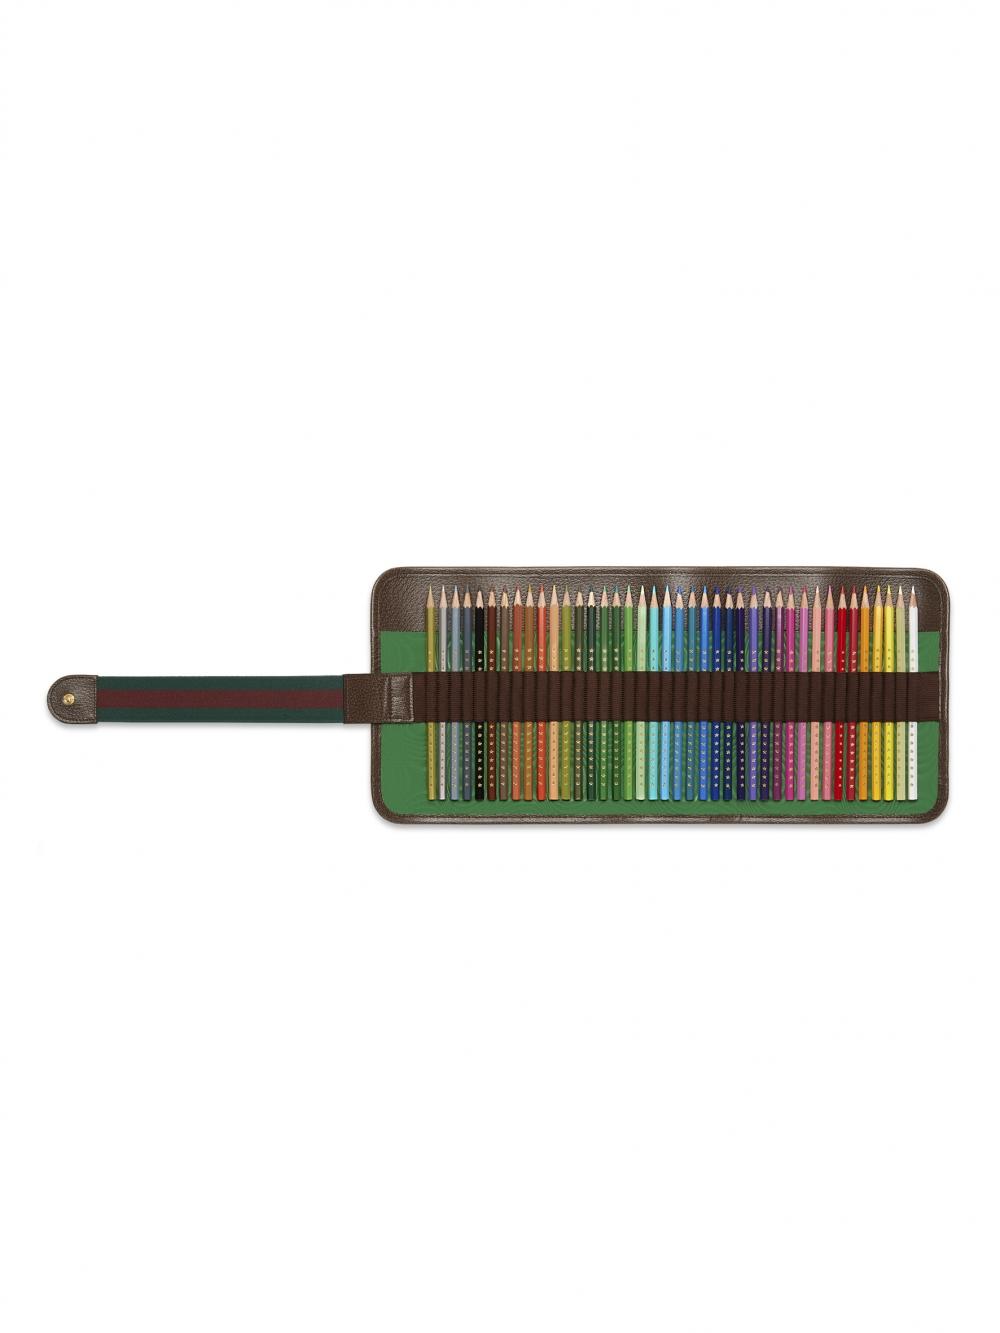 2021Gucci全新色鉛筆盒圖